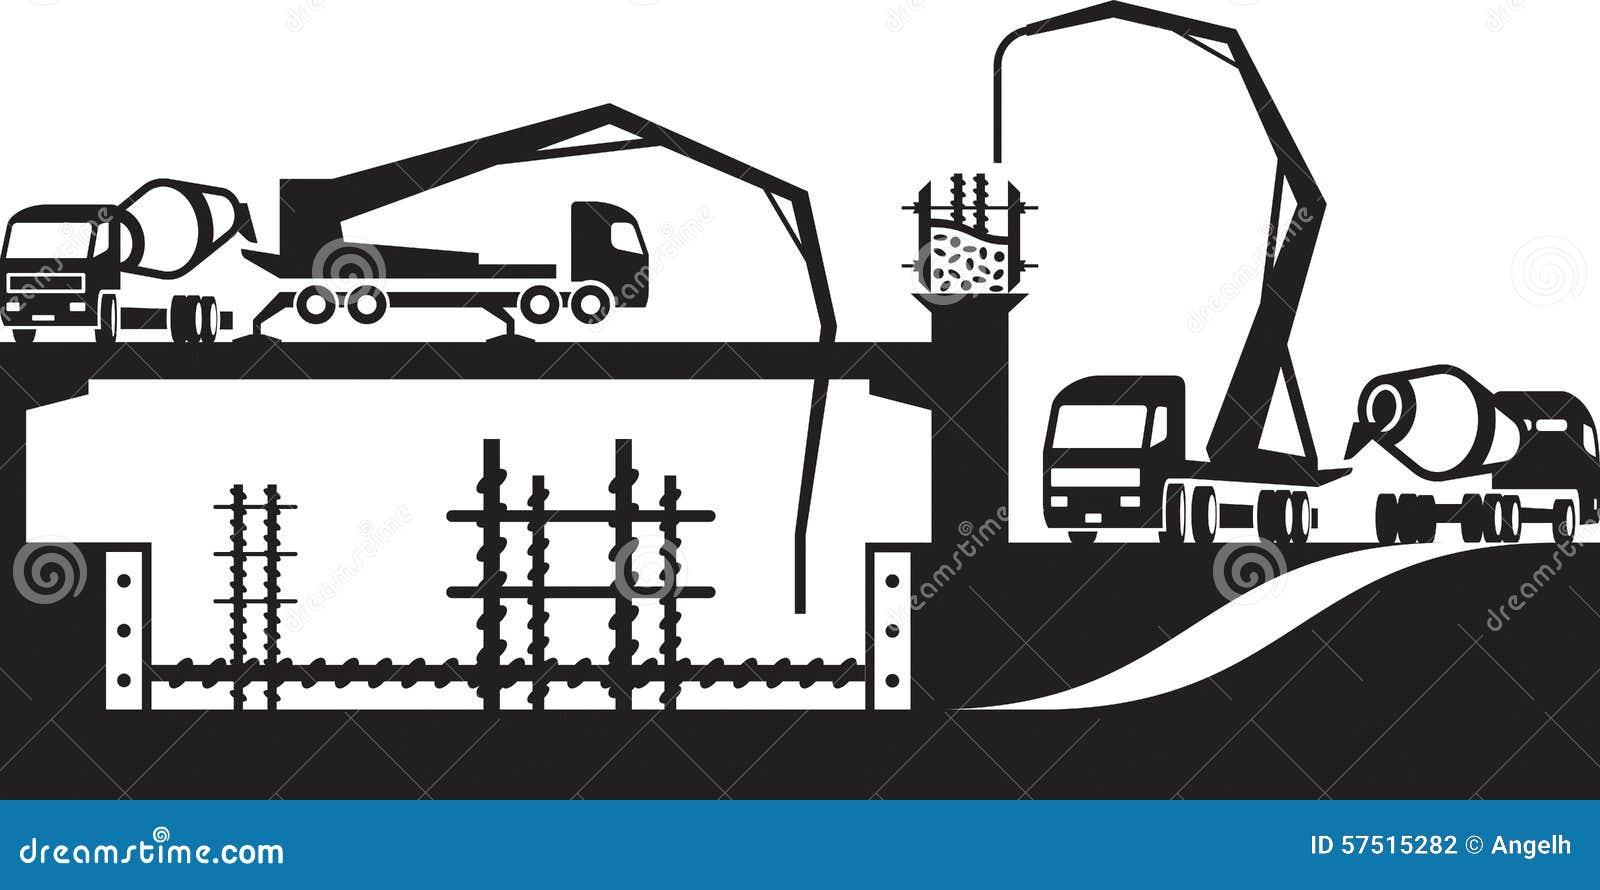 Stock Illustration Pouring Concrete Construction Site Vector Illustration Image57515282 on Cement Pump Truck